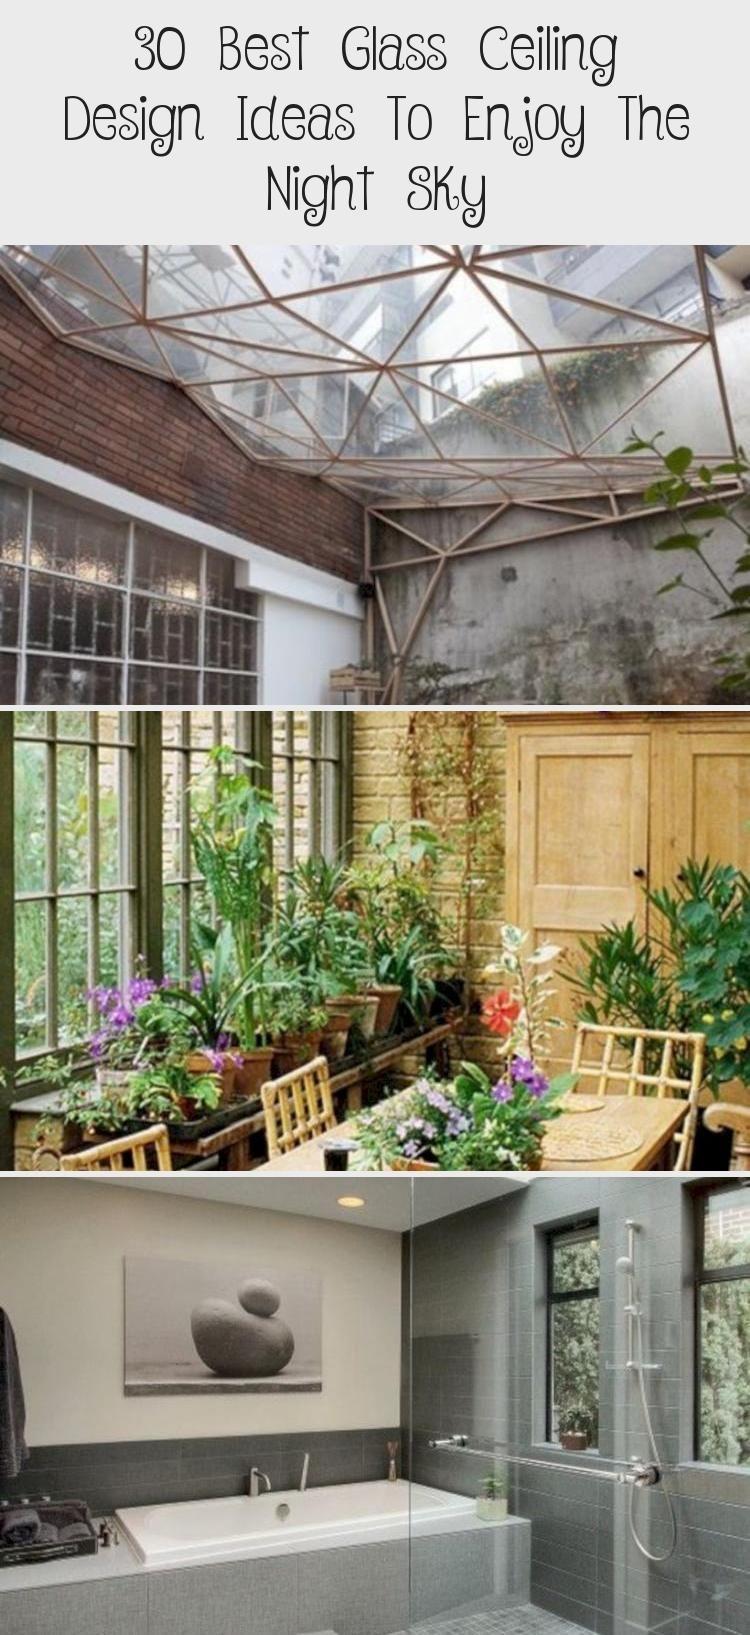 My Blog En Blog Garden Room Ceiling Design Contemporary Interior Design